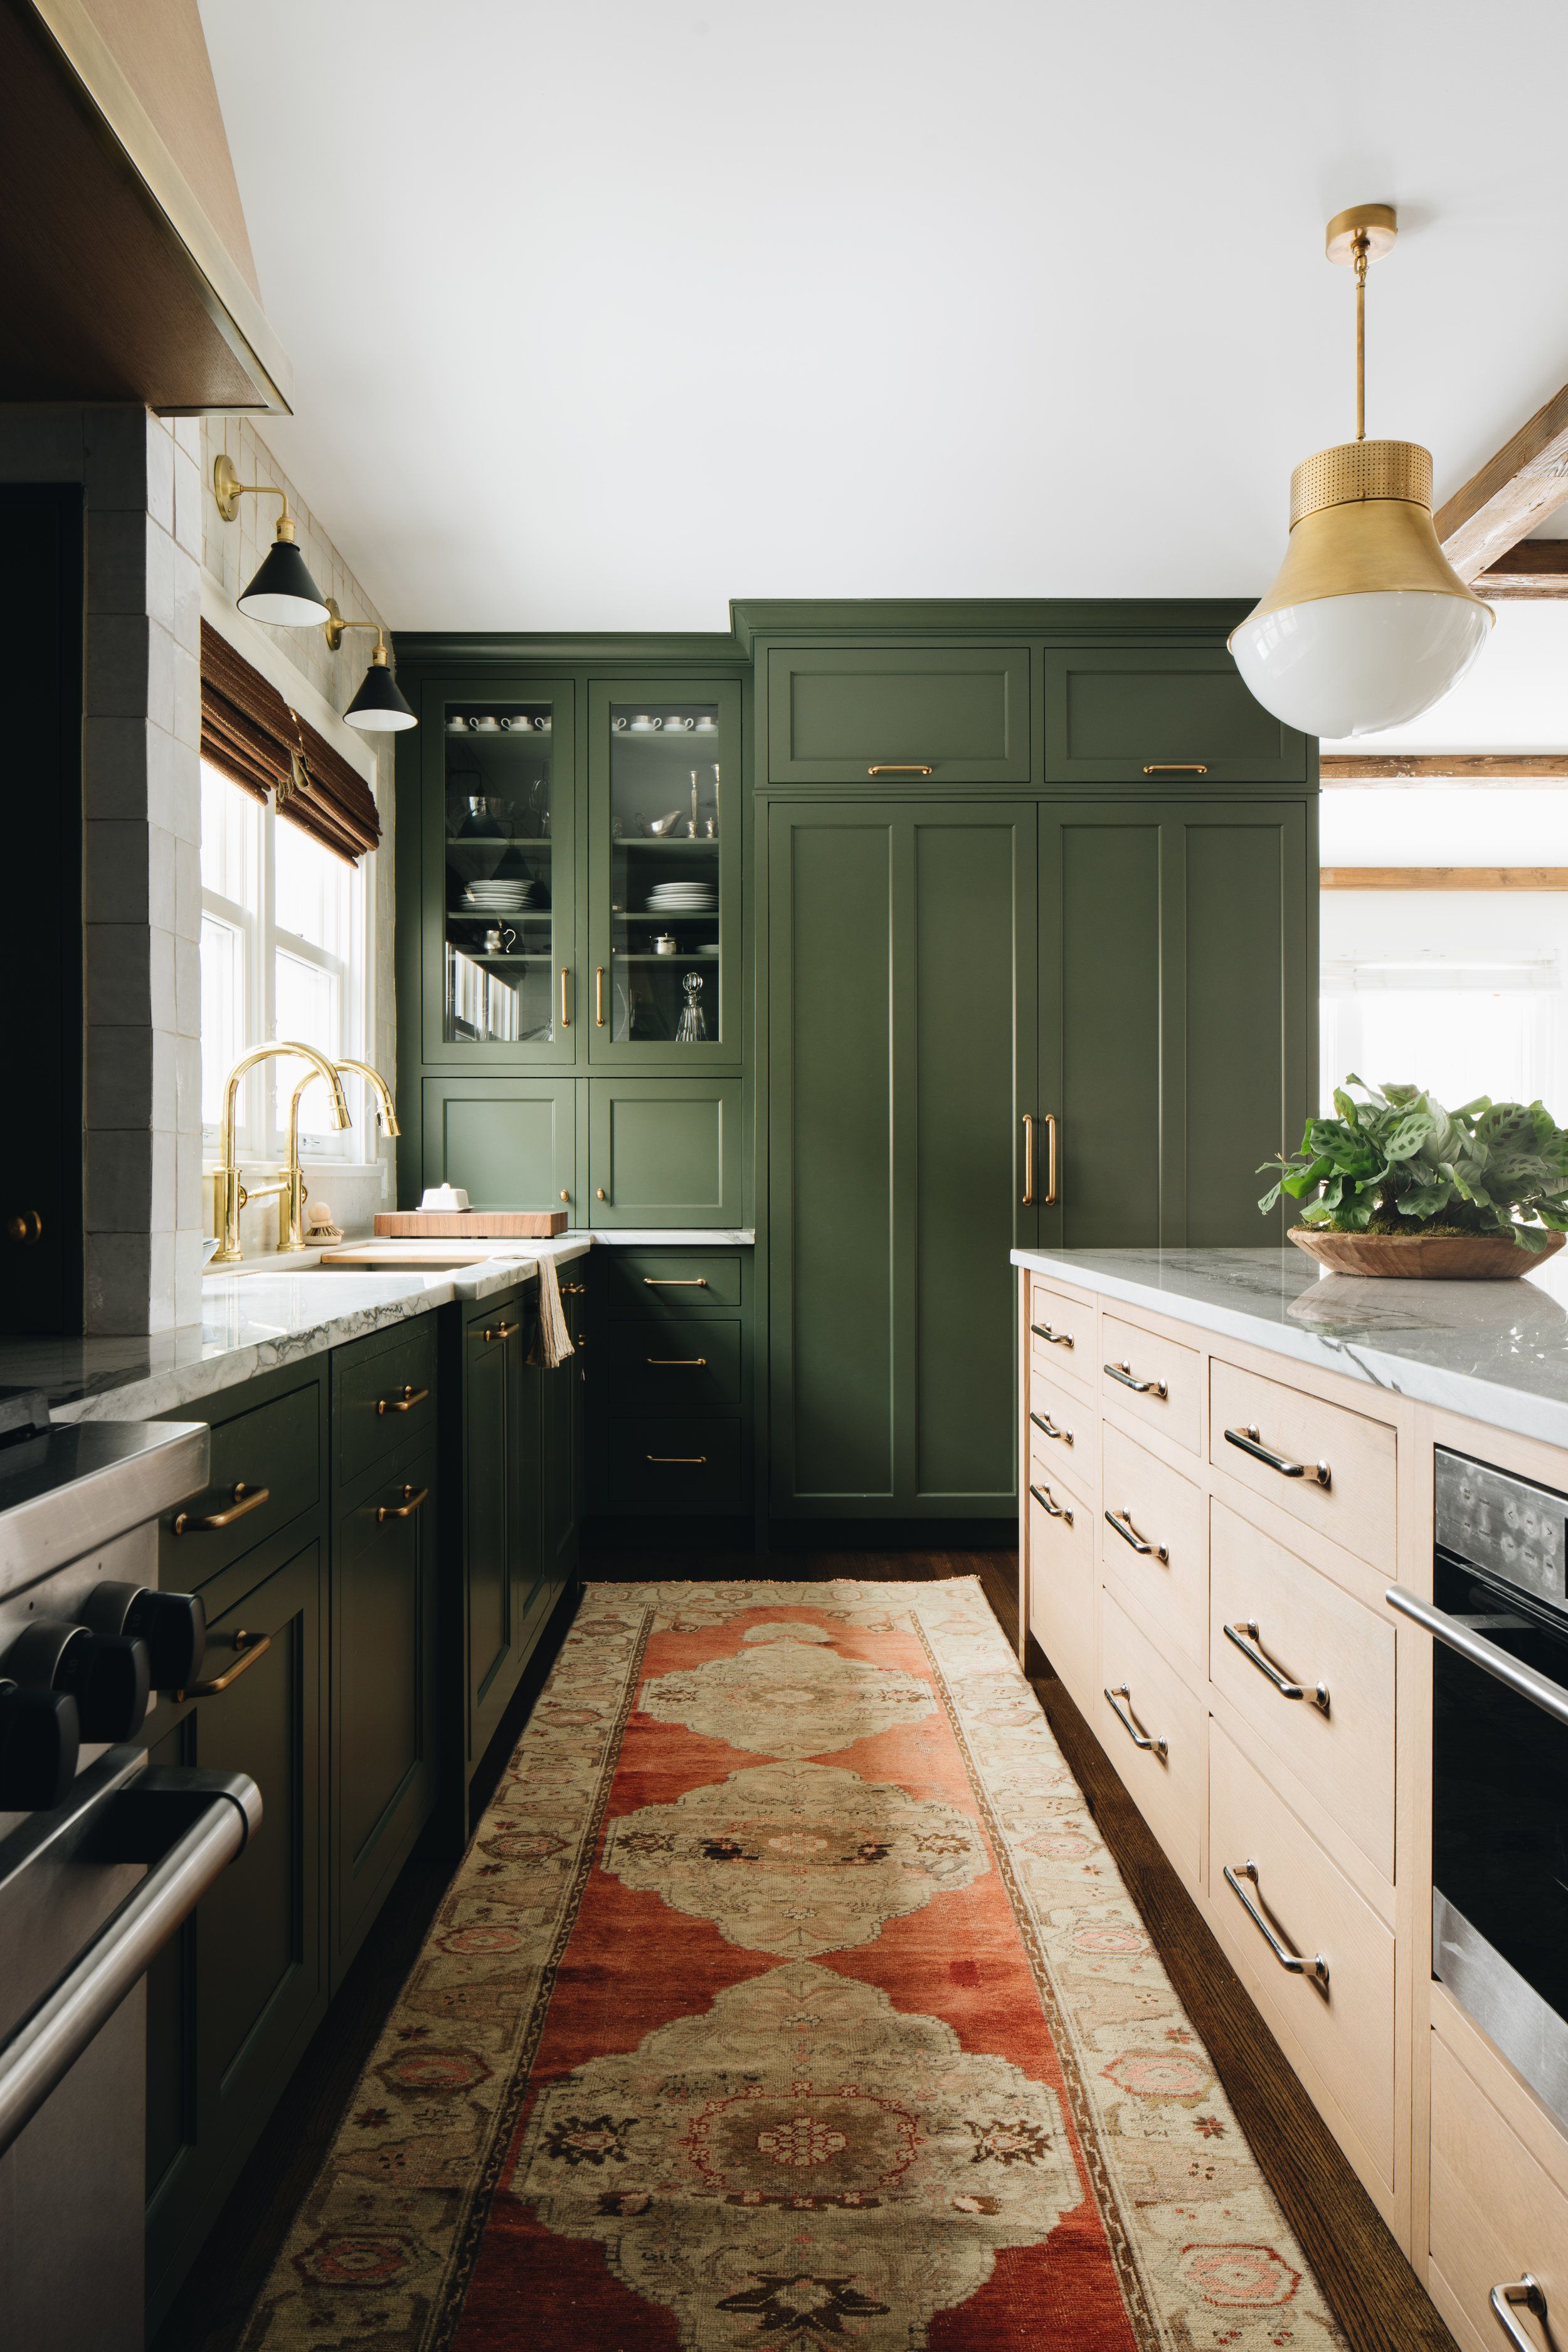 Fair Oaks Jean Stoffer Design Green Kitchen Cabinets Kitchen Design Kitchen Renovation